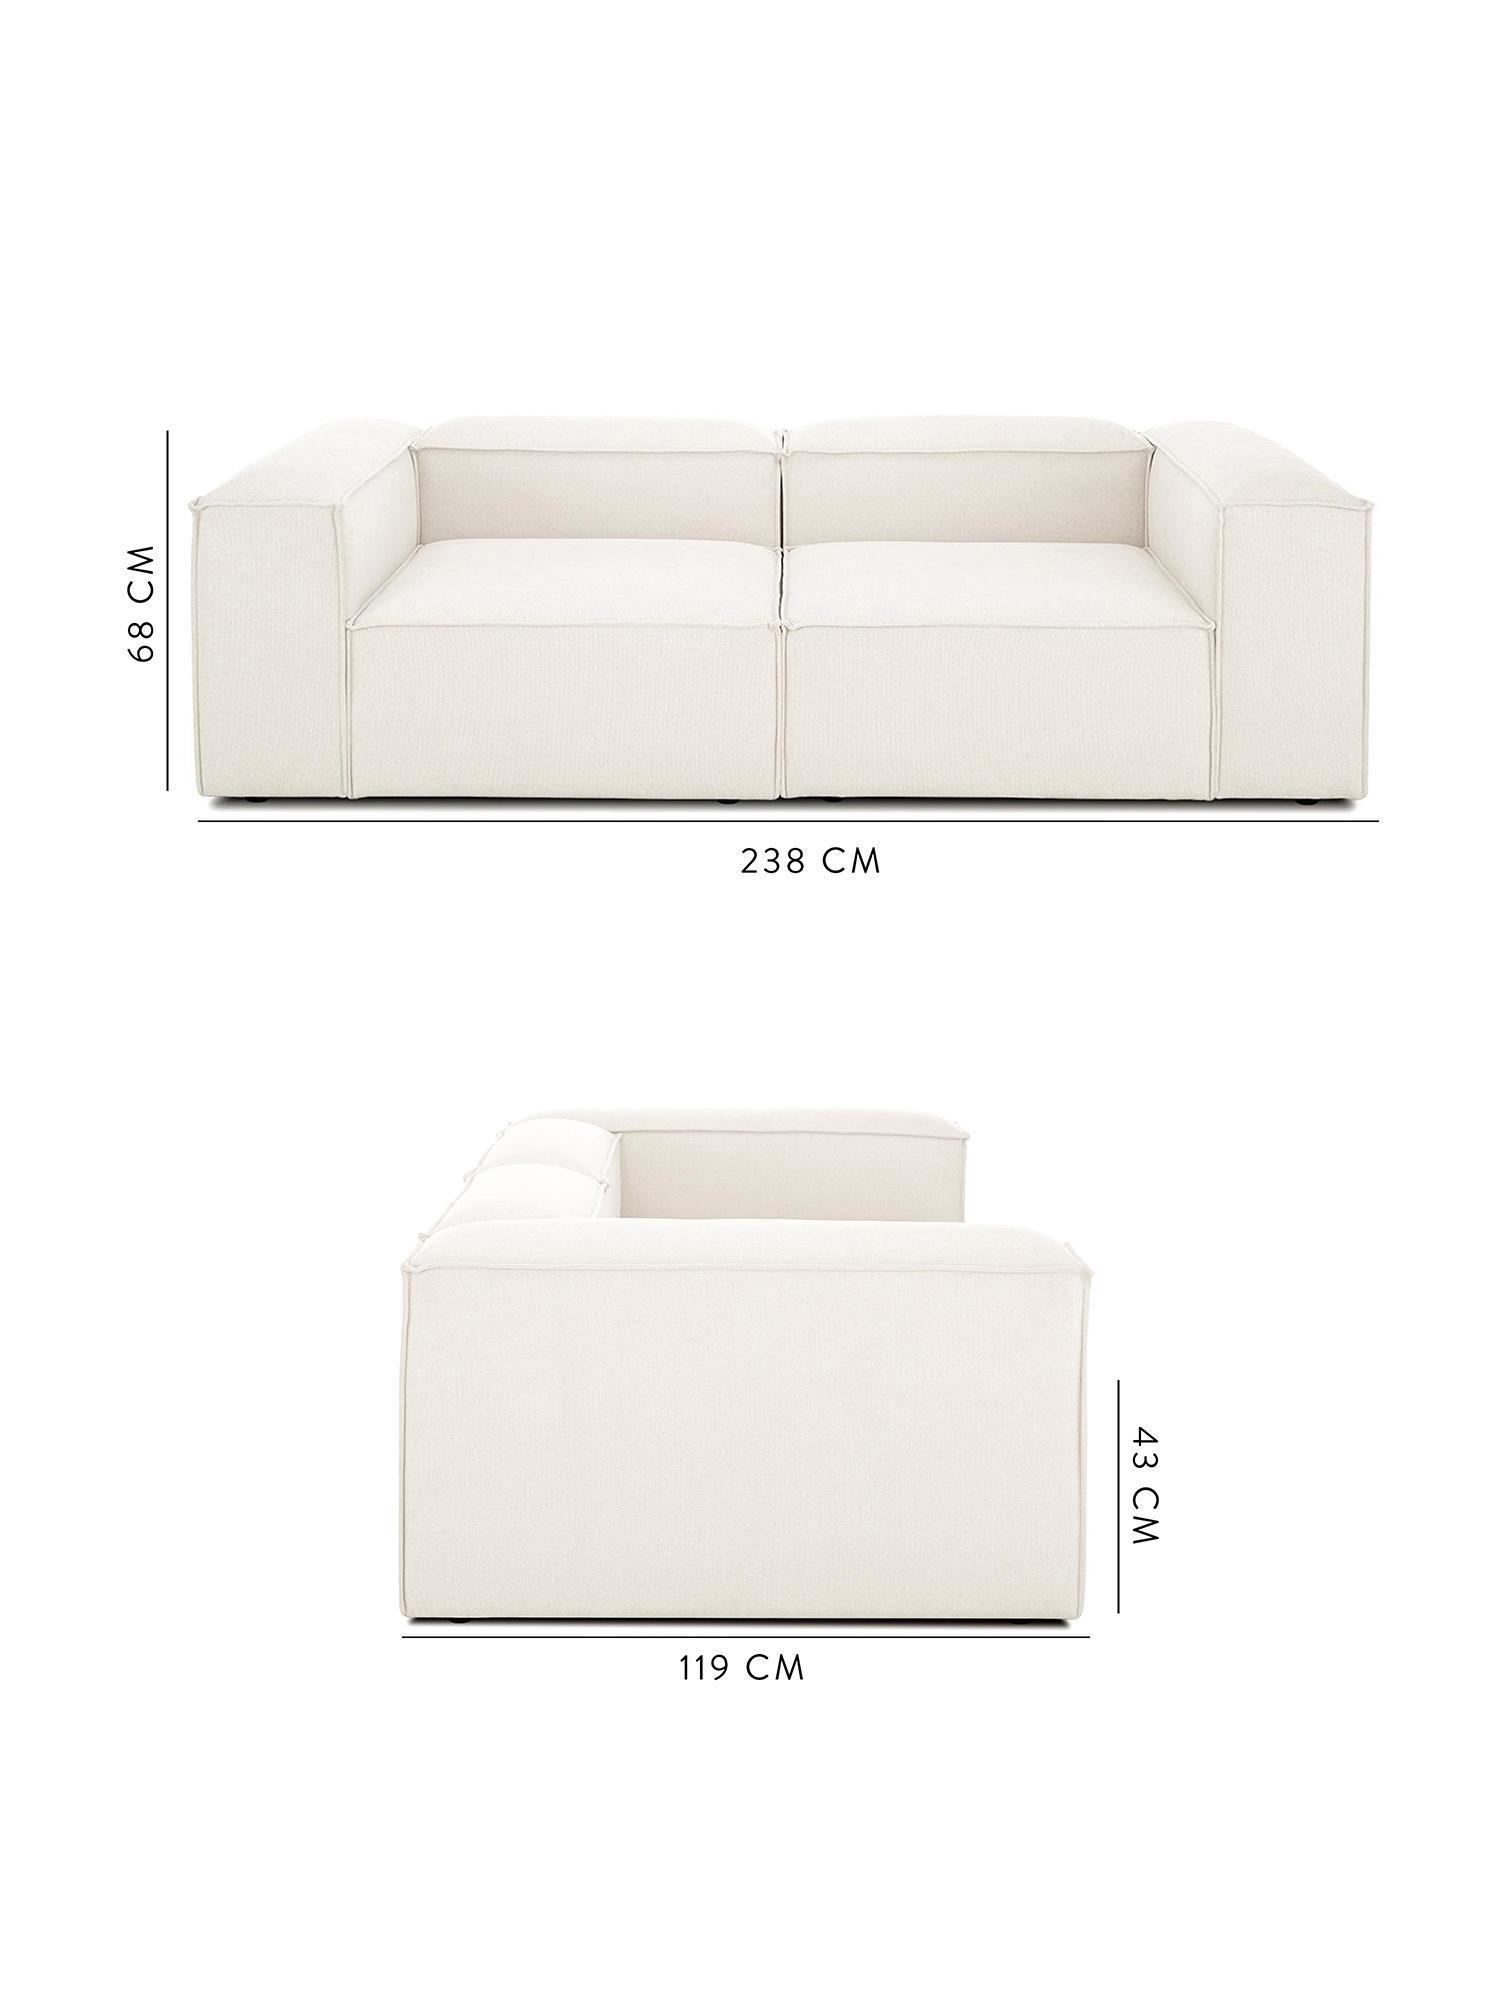 Modulaire bank Lennon (3-zits), Bekleding: polyester, Frame: massief grenenhout, multi, Poten: kunststof, Beige, B 242 x D 121 cm